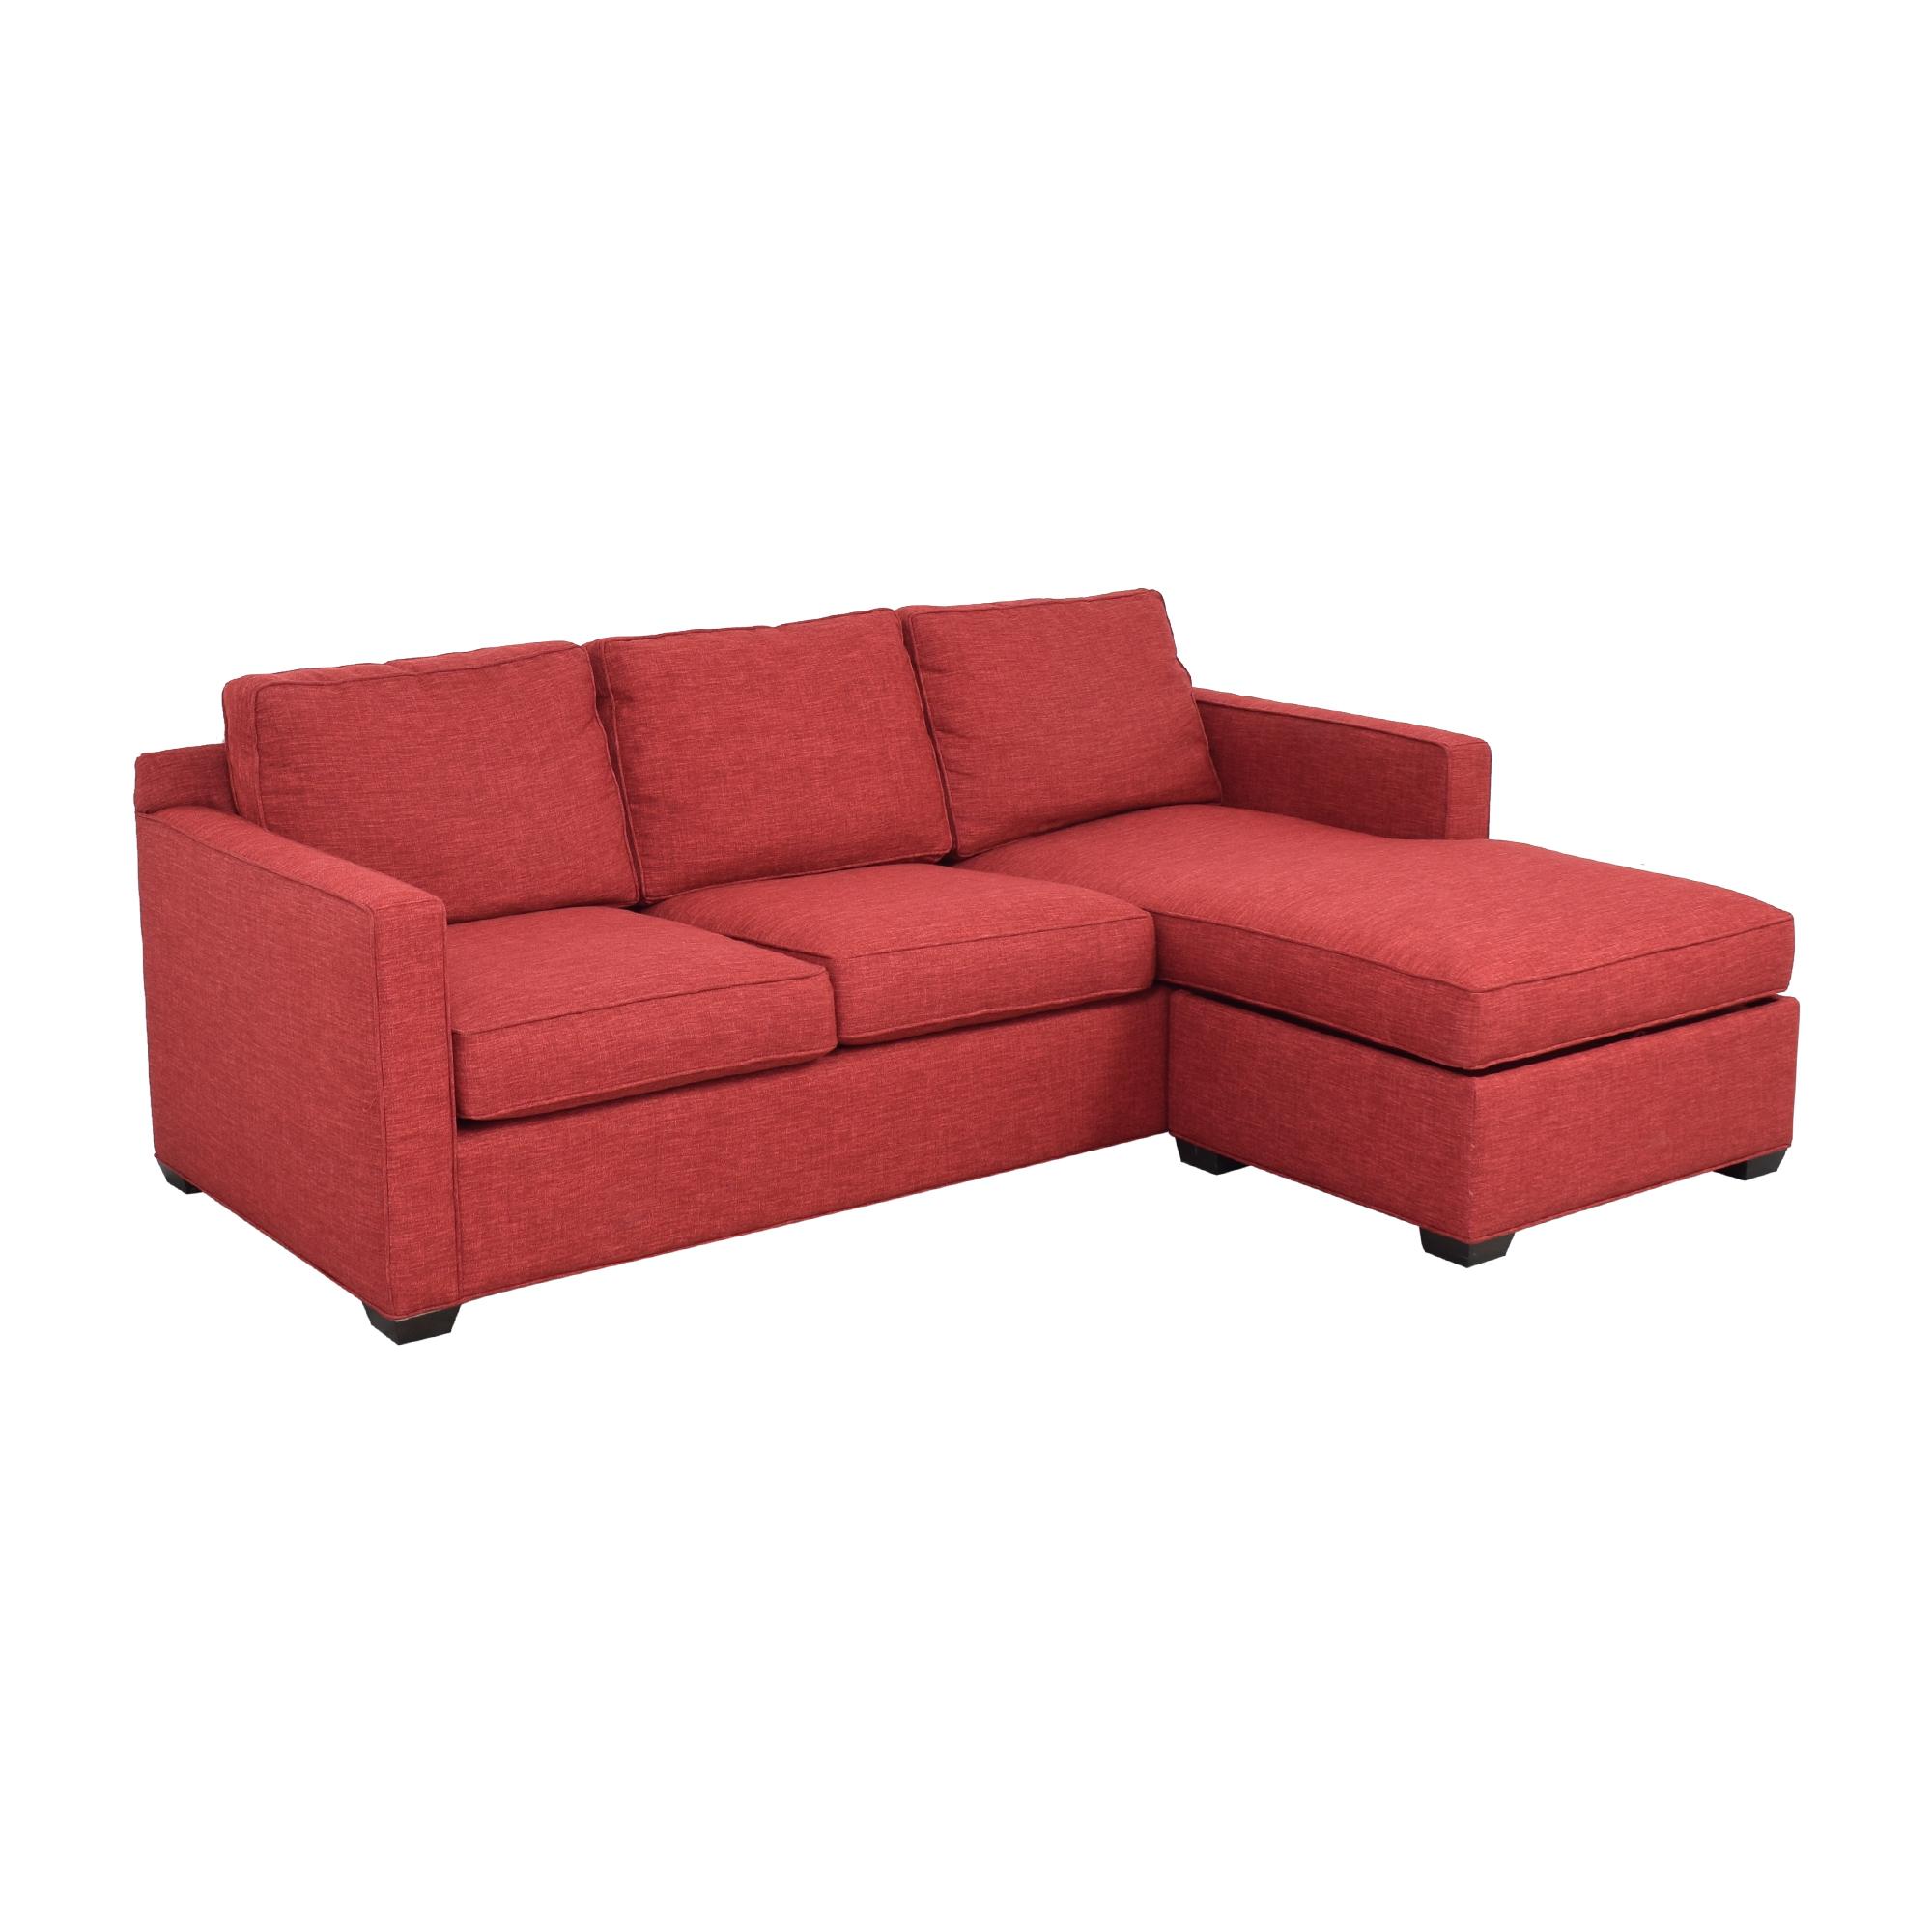 Crate & Barrel Crate & Barrel Davis 3-Seat Lounger Sofa second hand